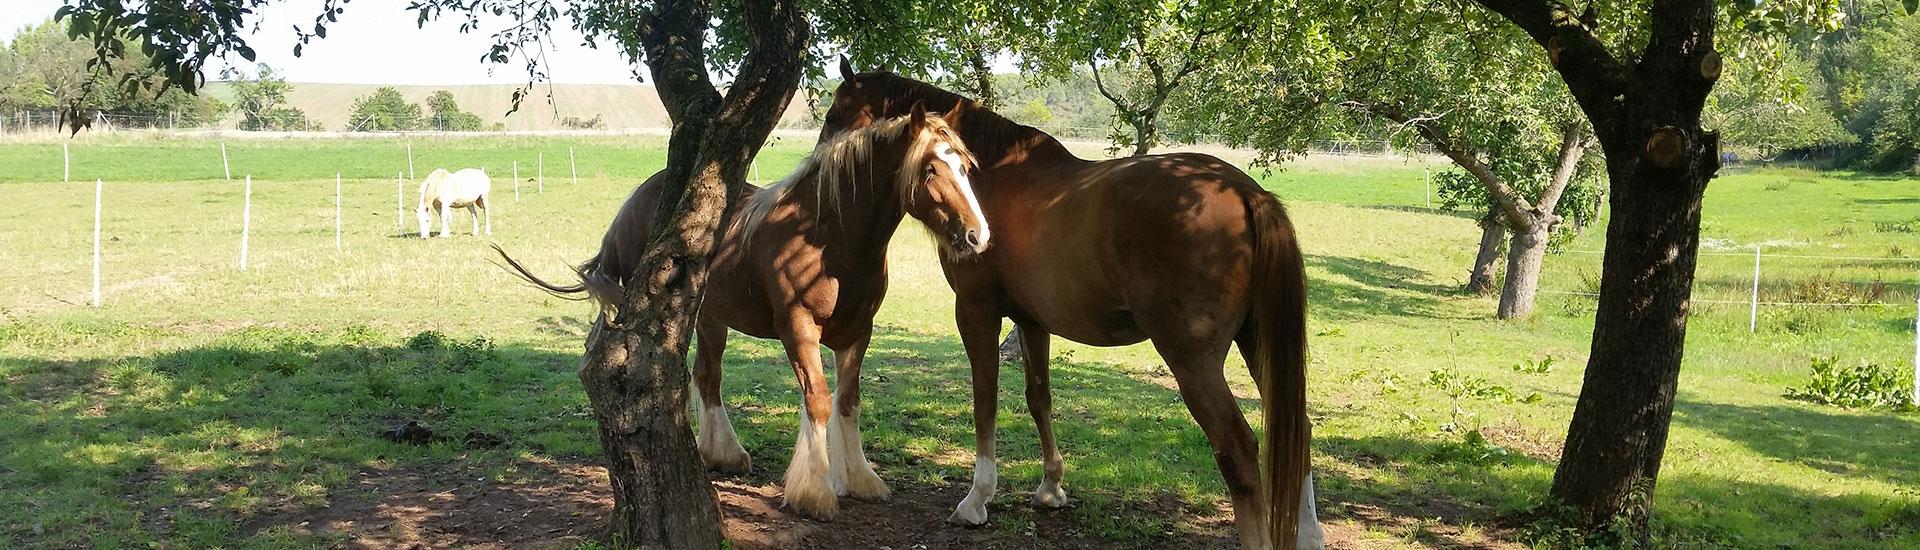 TILL e.V. - Tiergestütztes Leben und Lernen